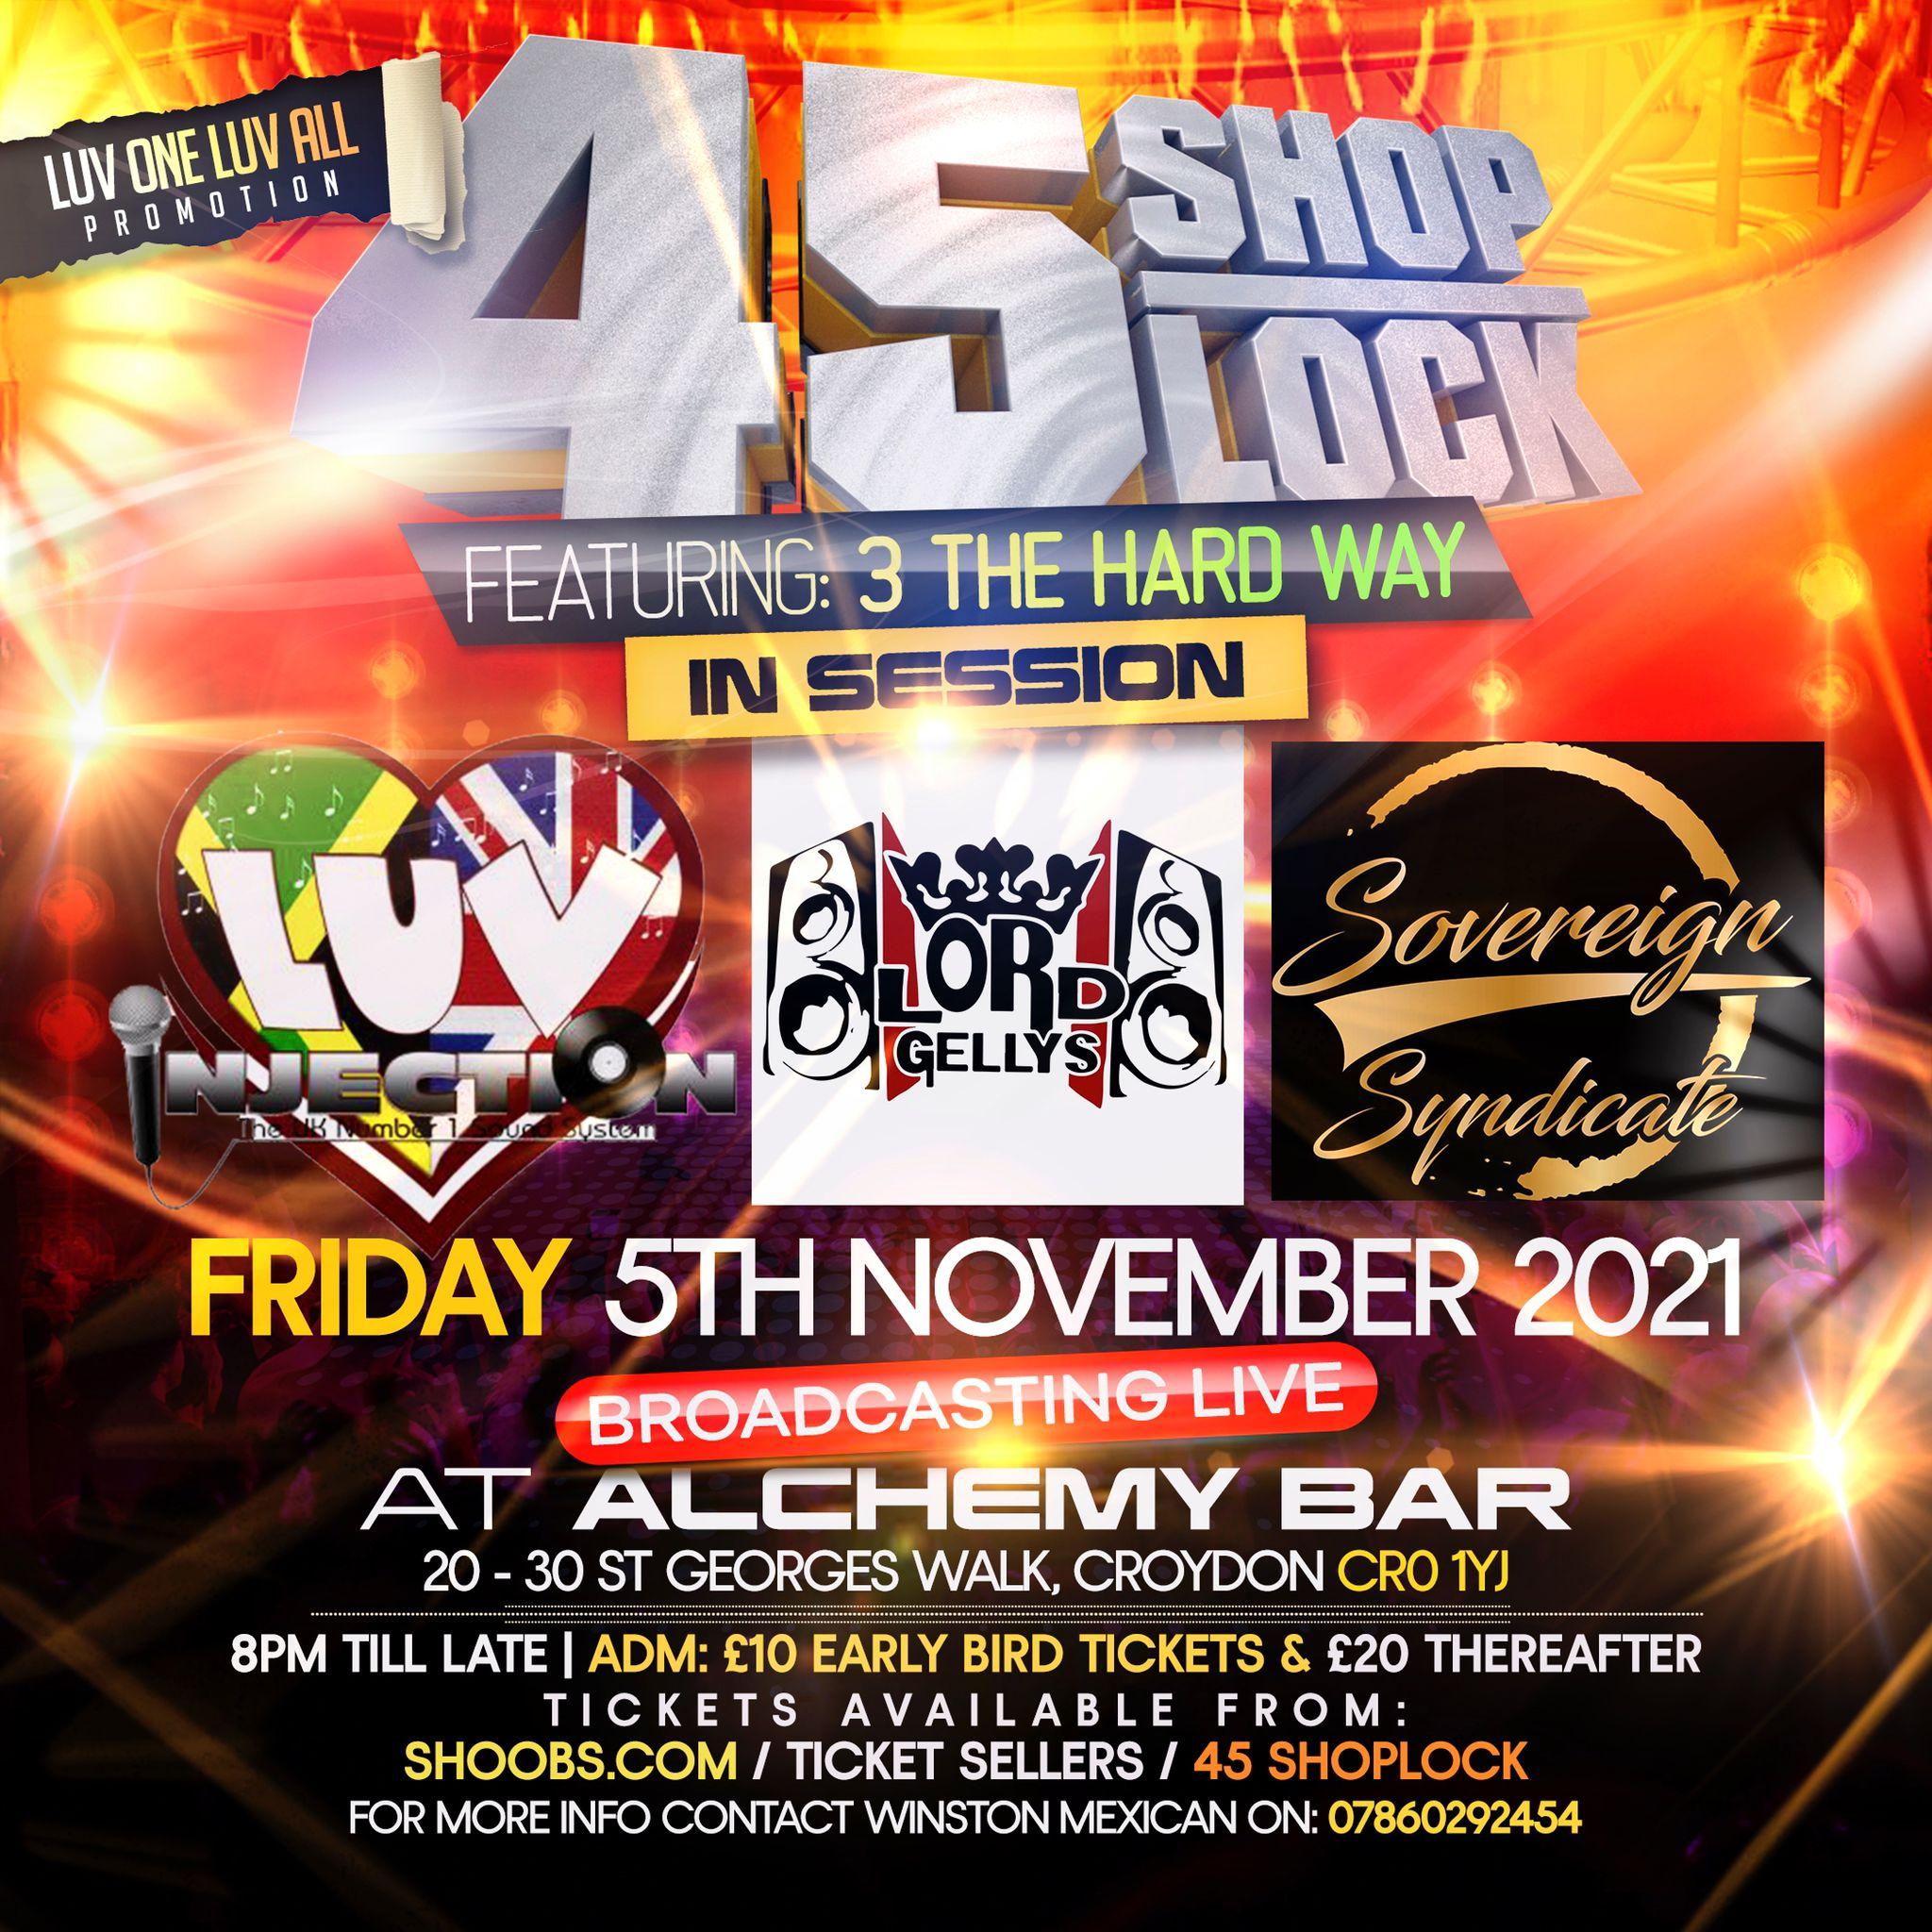 45 Shop Lock 3 The Hardway